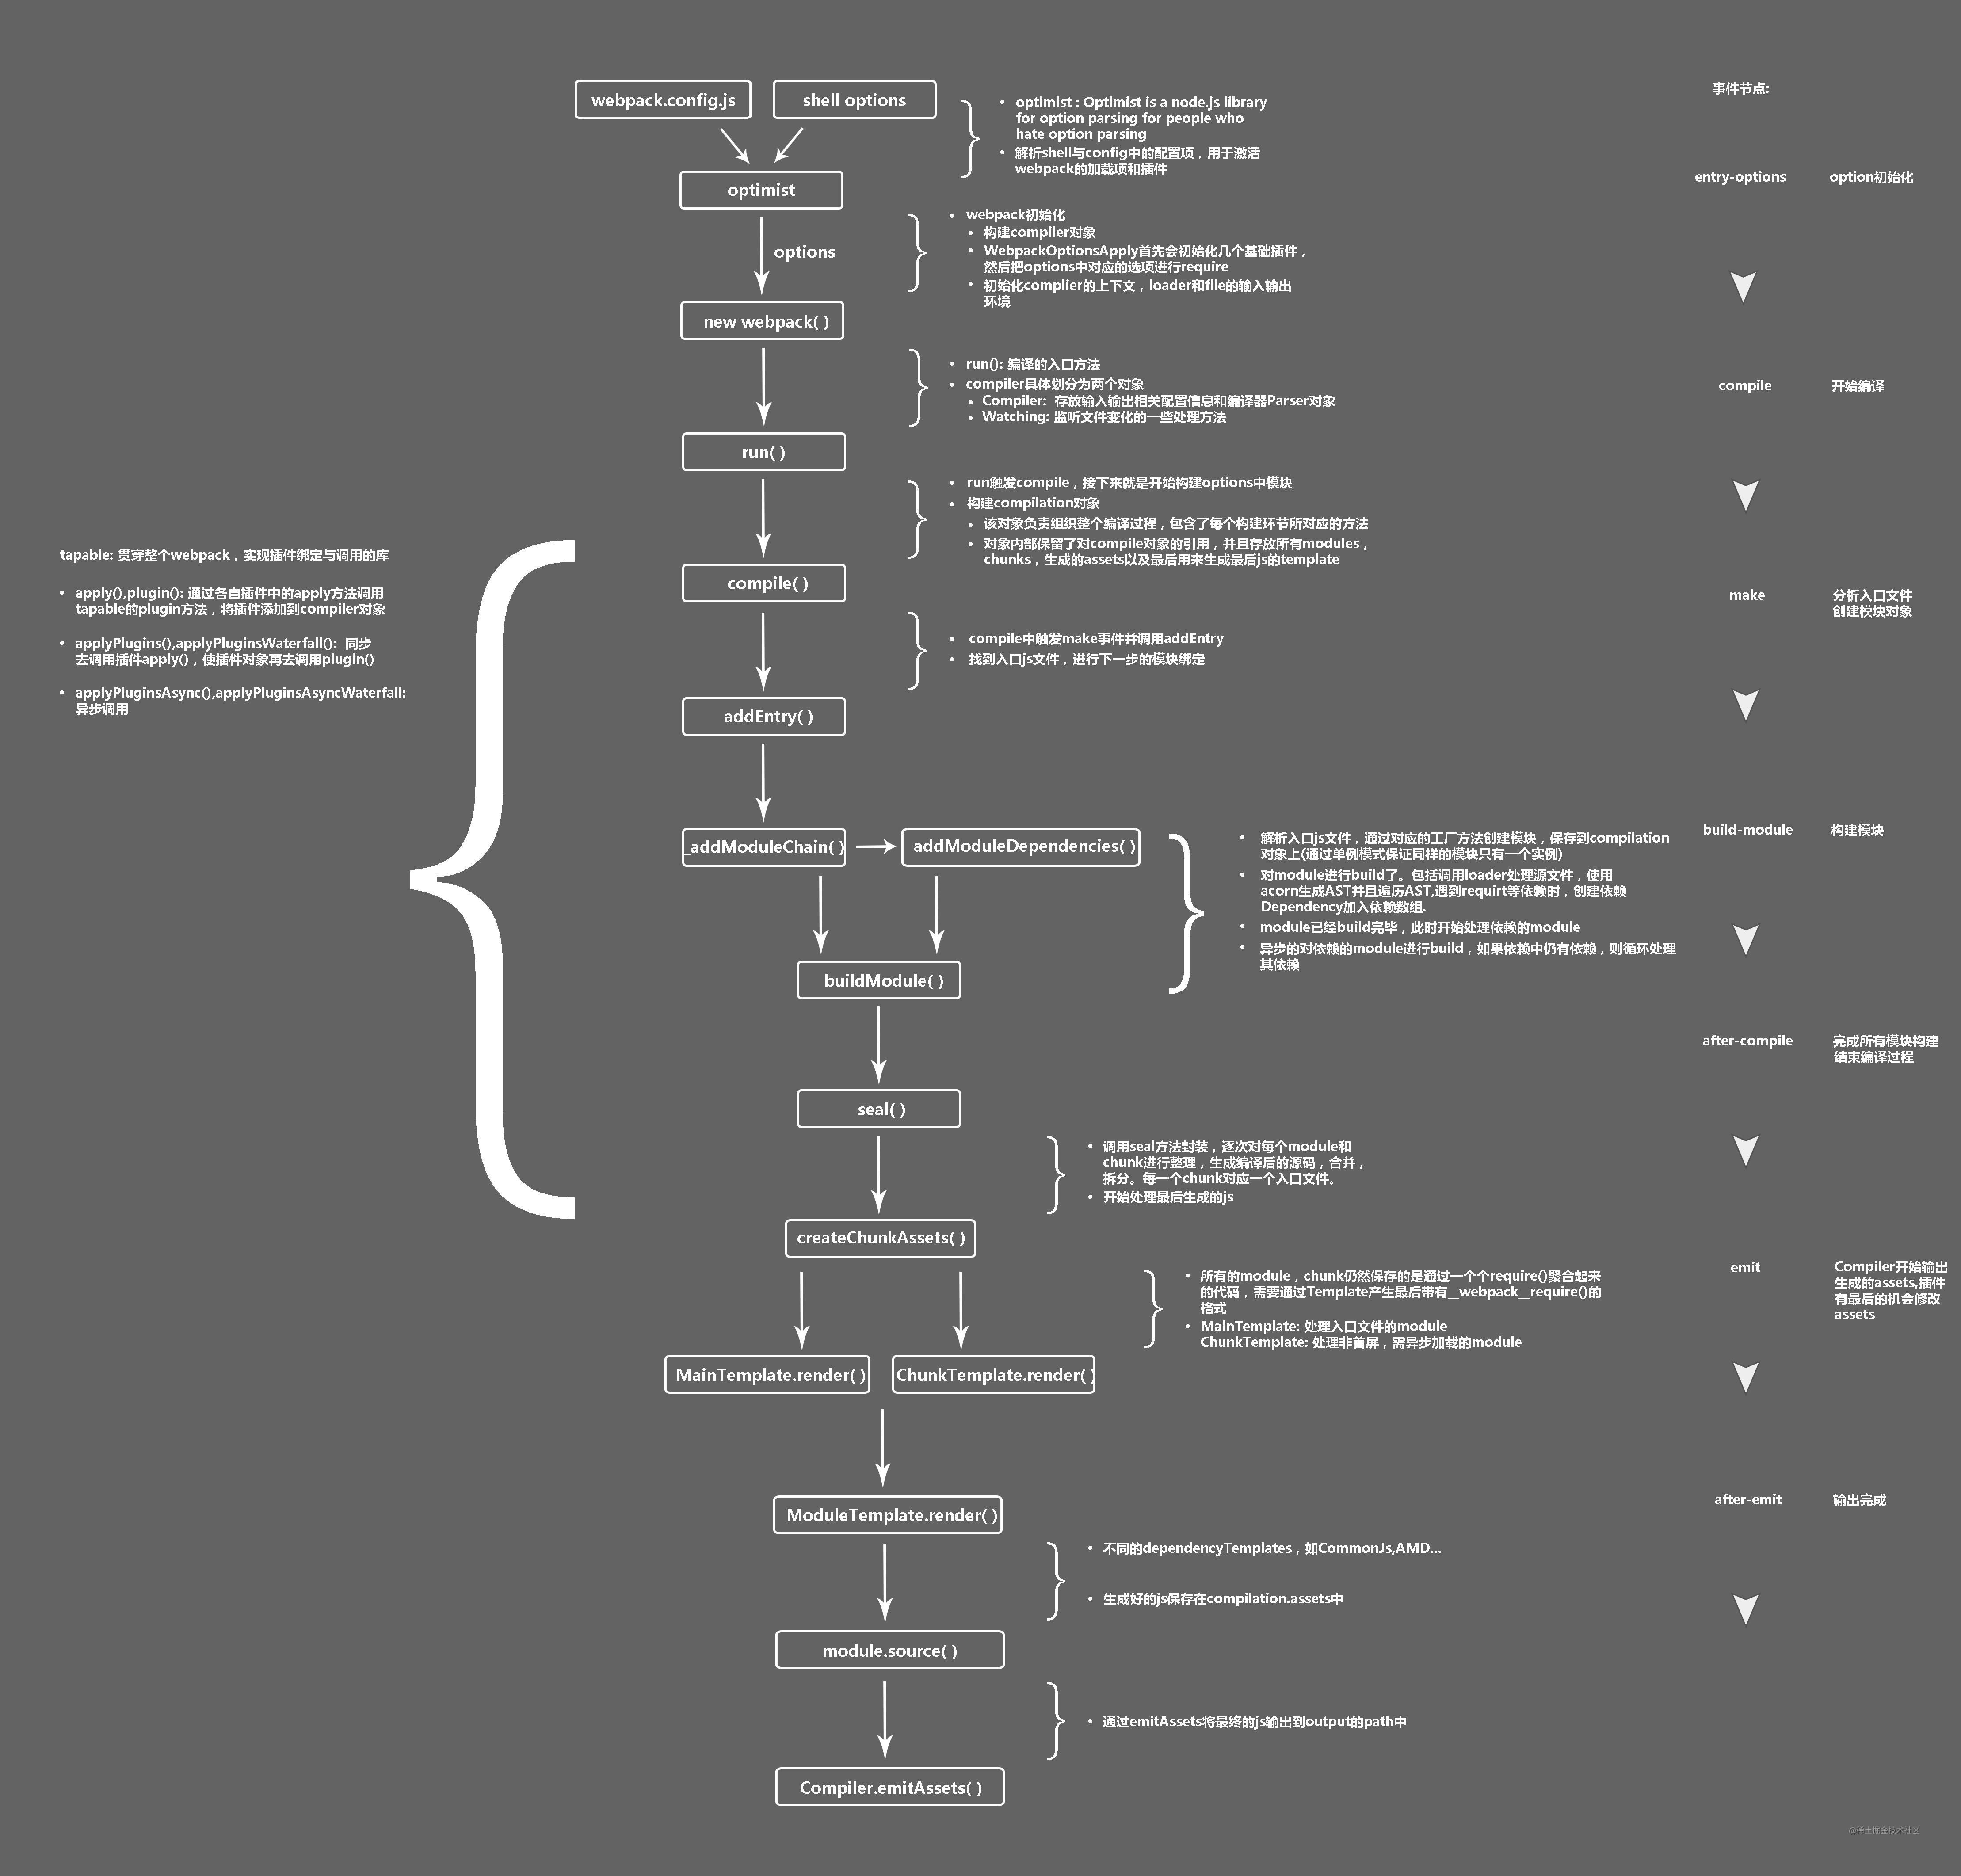 webpack 整体流程图